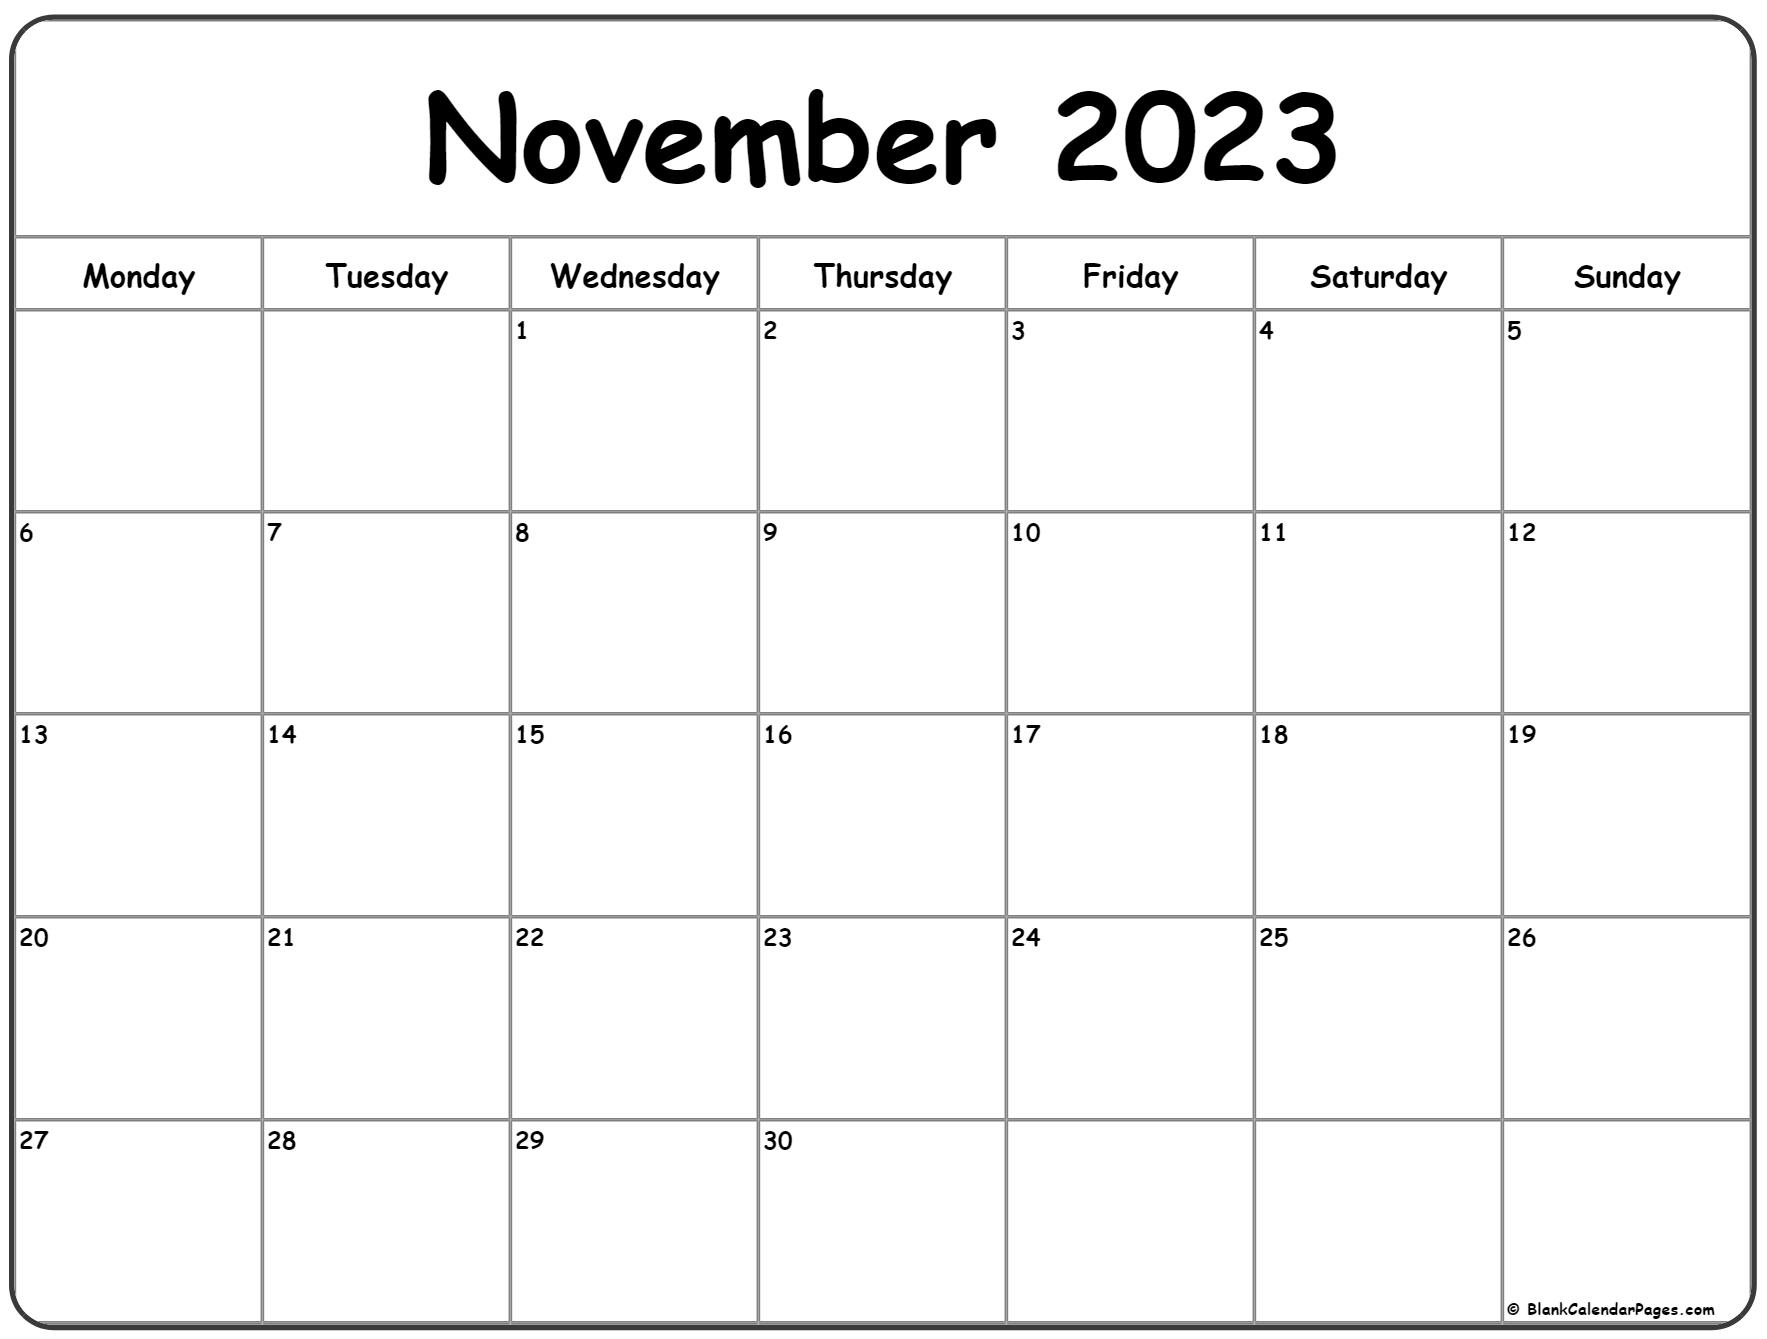 November 2023 Monday calendar. Monday to Sunday